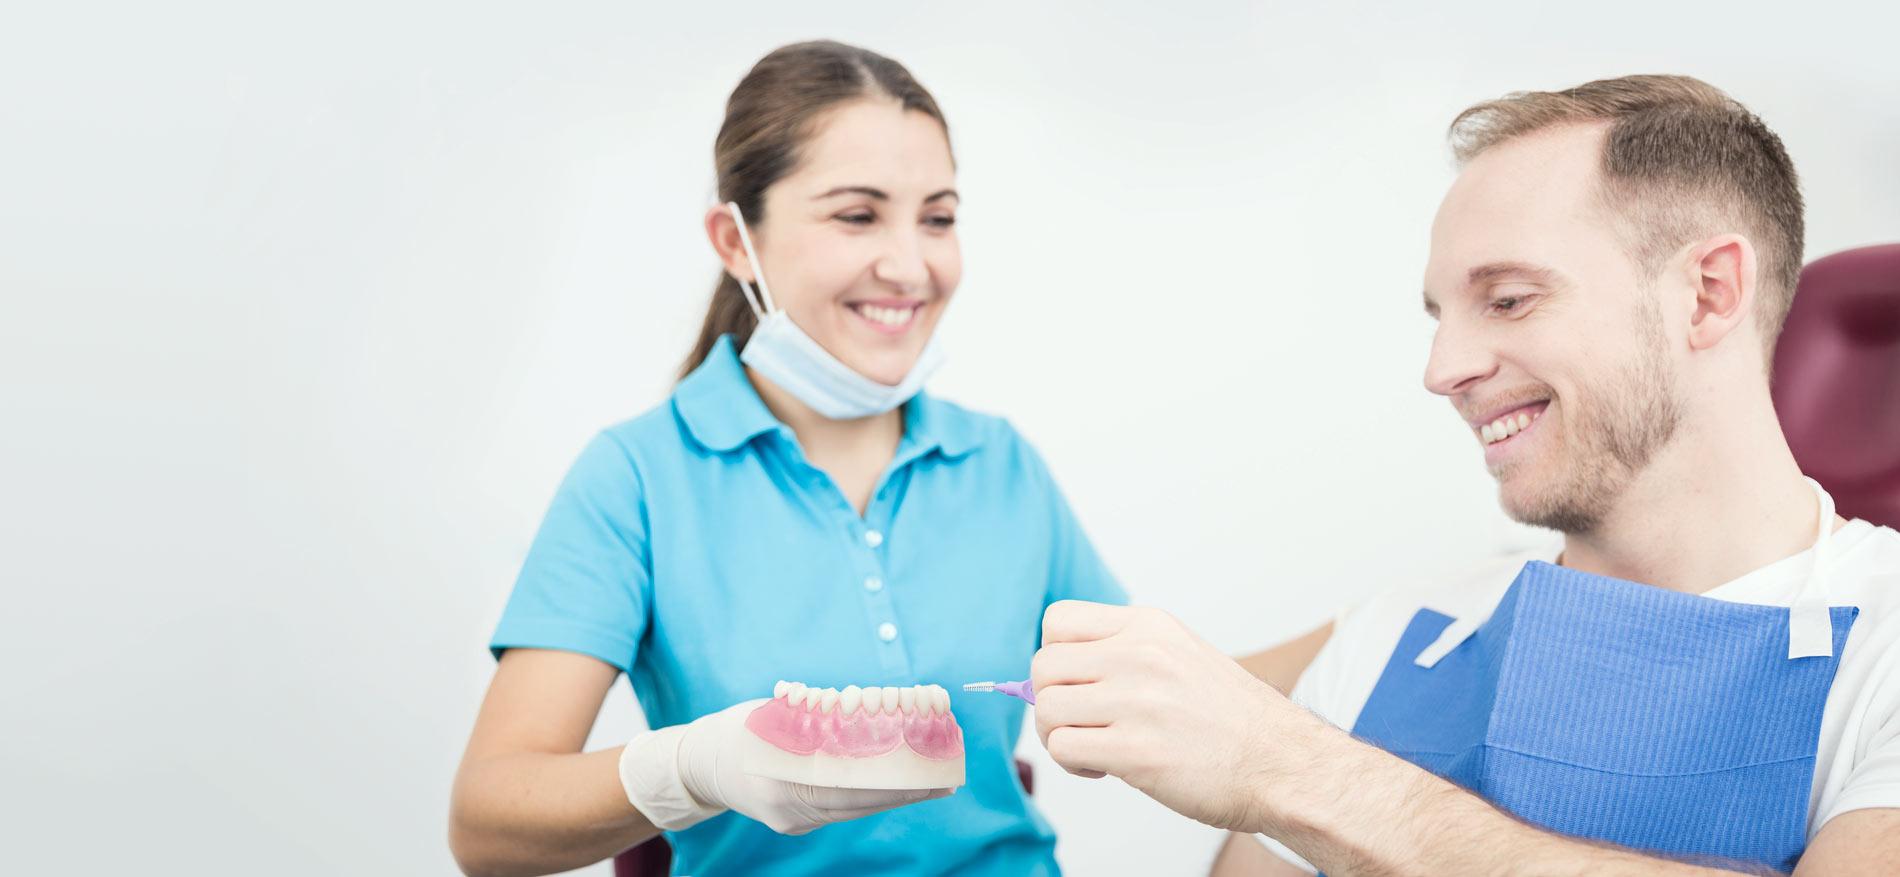 Zahnarztpraxis Wünsch – Stuttgart - Prophylaxe – PZR (Professionelle Zahnreinigung) 1